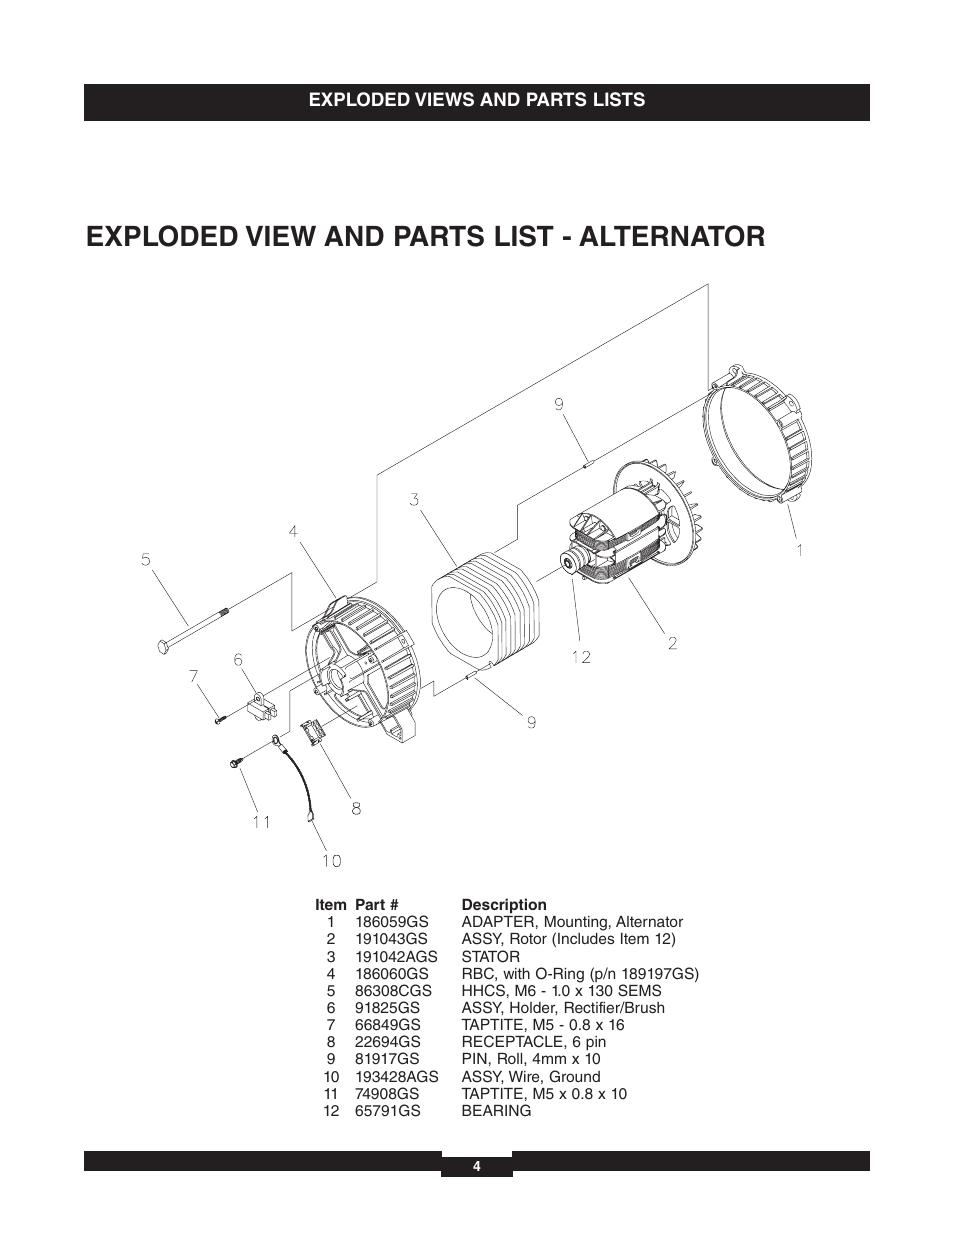 Exploded view and parts list - alternator | Briggs ... on briggs stratton gas engine diagram, briggs stratton throttle diagram, briggs stratton engine electrical diagram, briggs stratton starter diagram, briggs stratton fuel pump diagram, briggs stratton engine parts diagram, briggs stratton ignition diagram, briggs stratton carburetor linkage diagram, briggs stratton pto diagram, briggs stratton motor diagram,